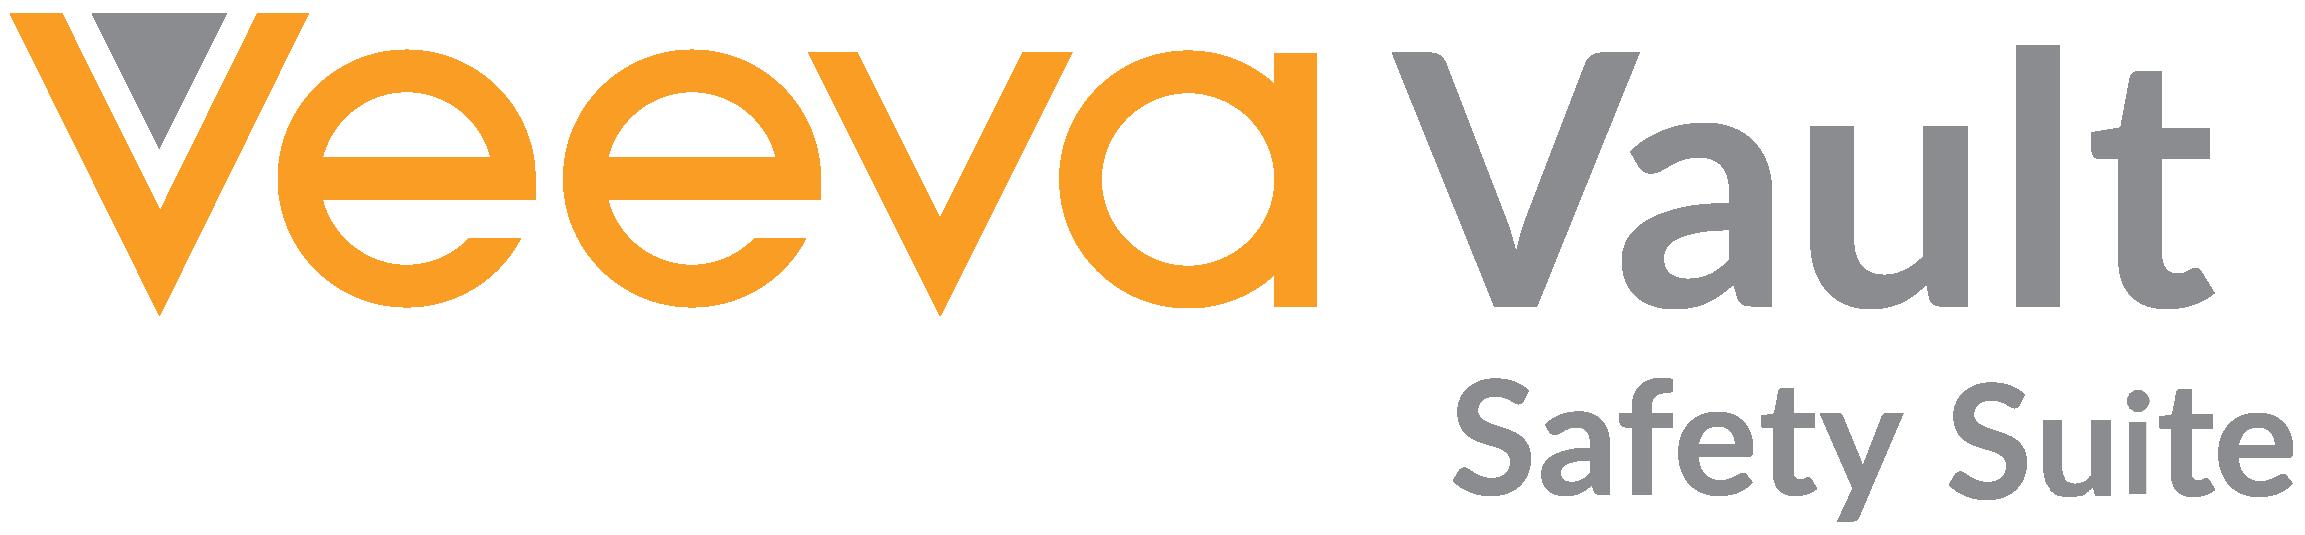 Veeva Vault Safety Help